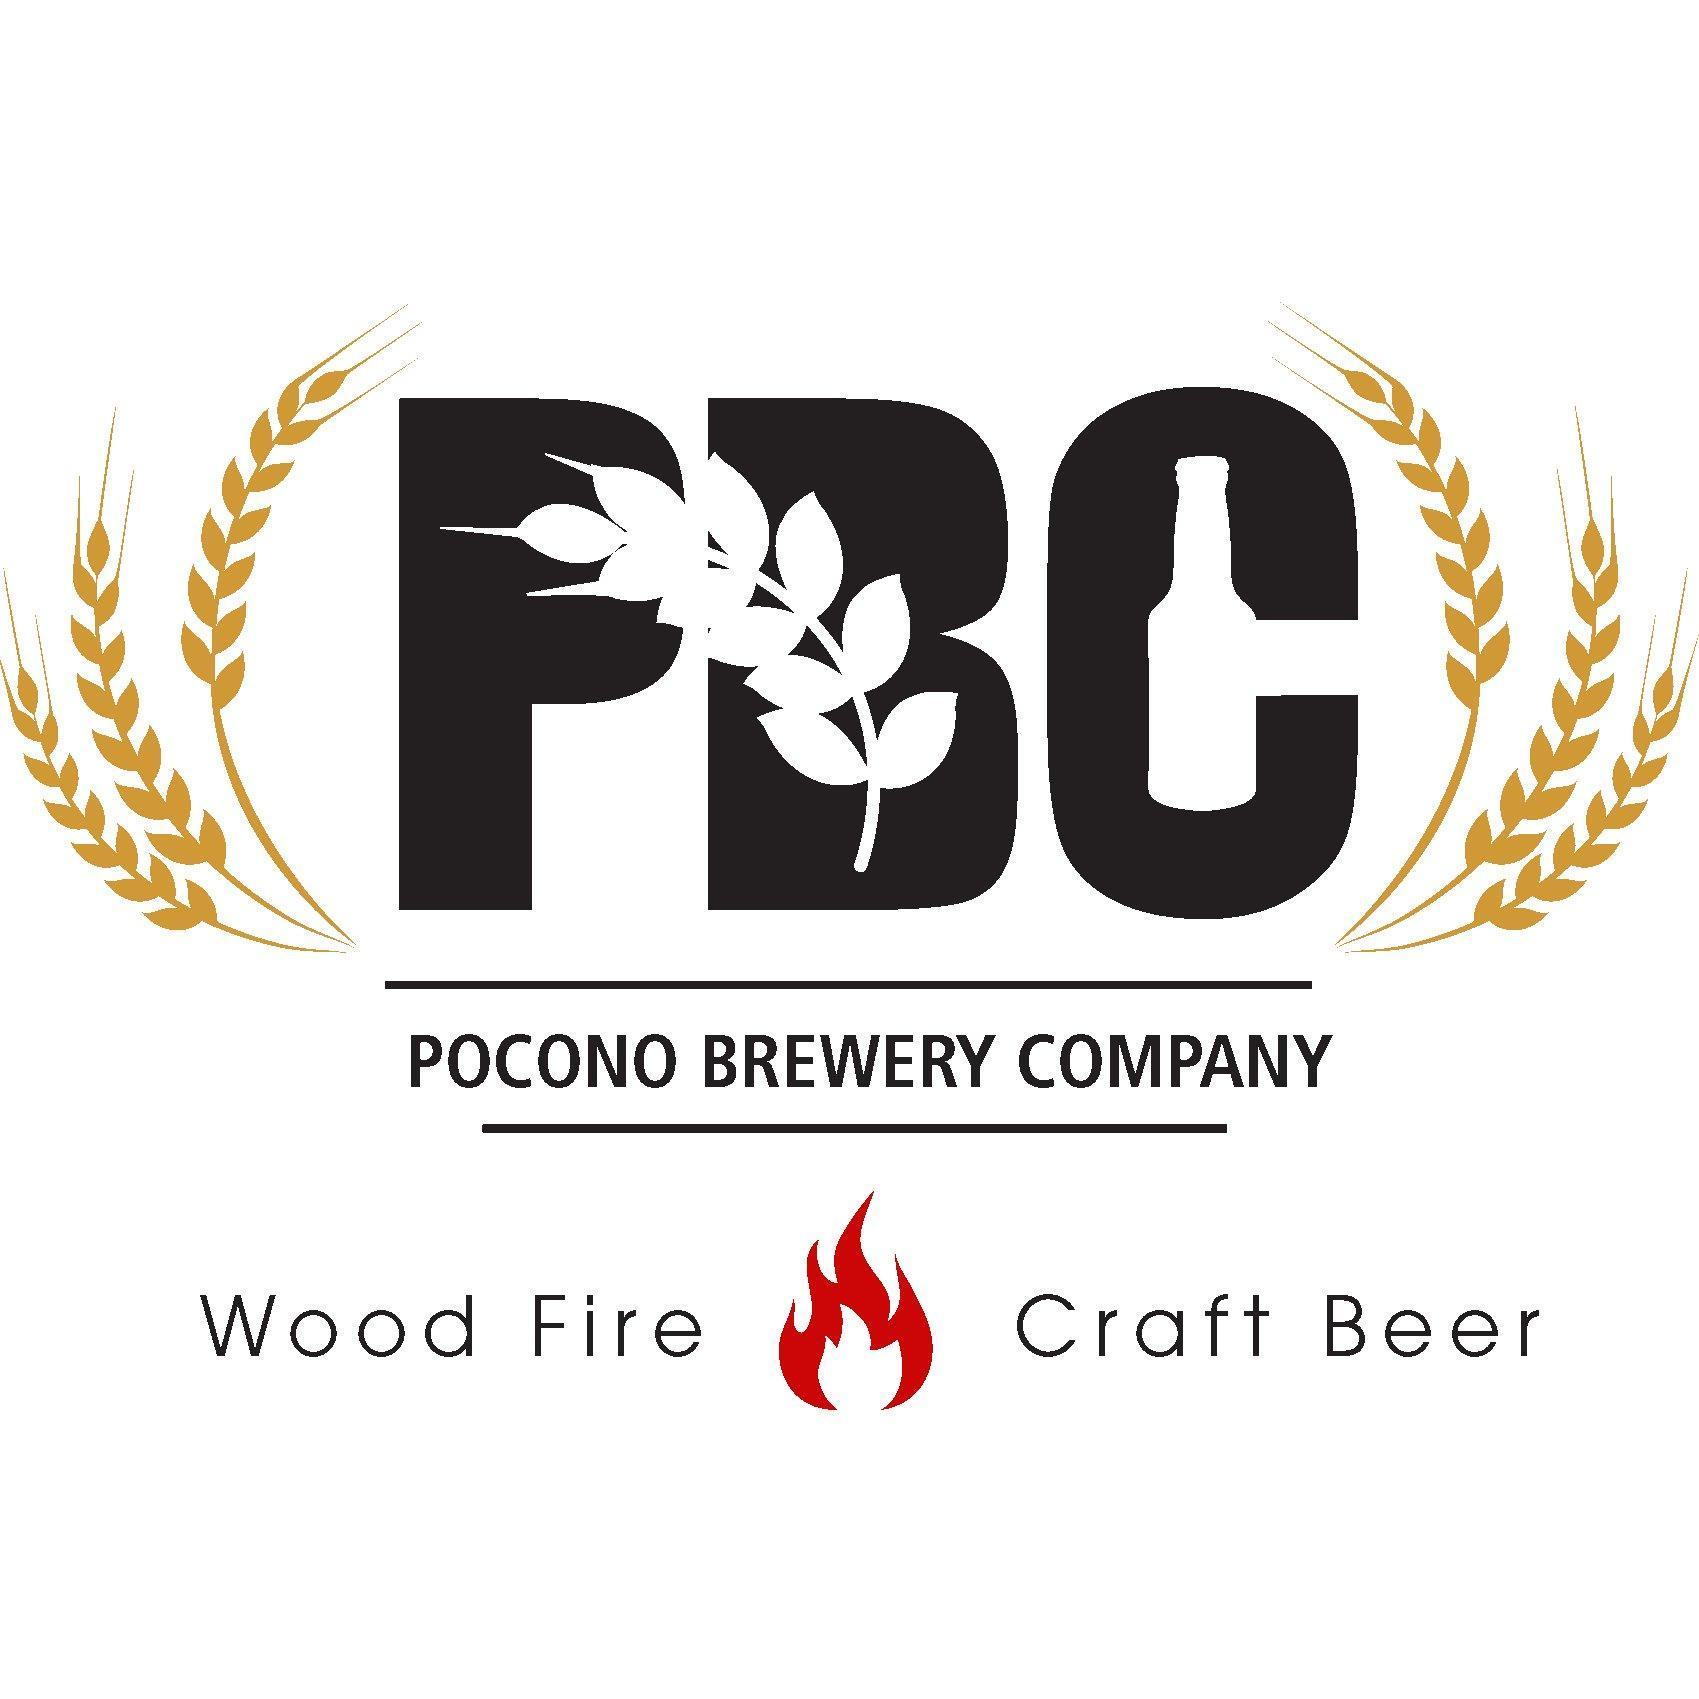 Pocono Brewery Company image 10